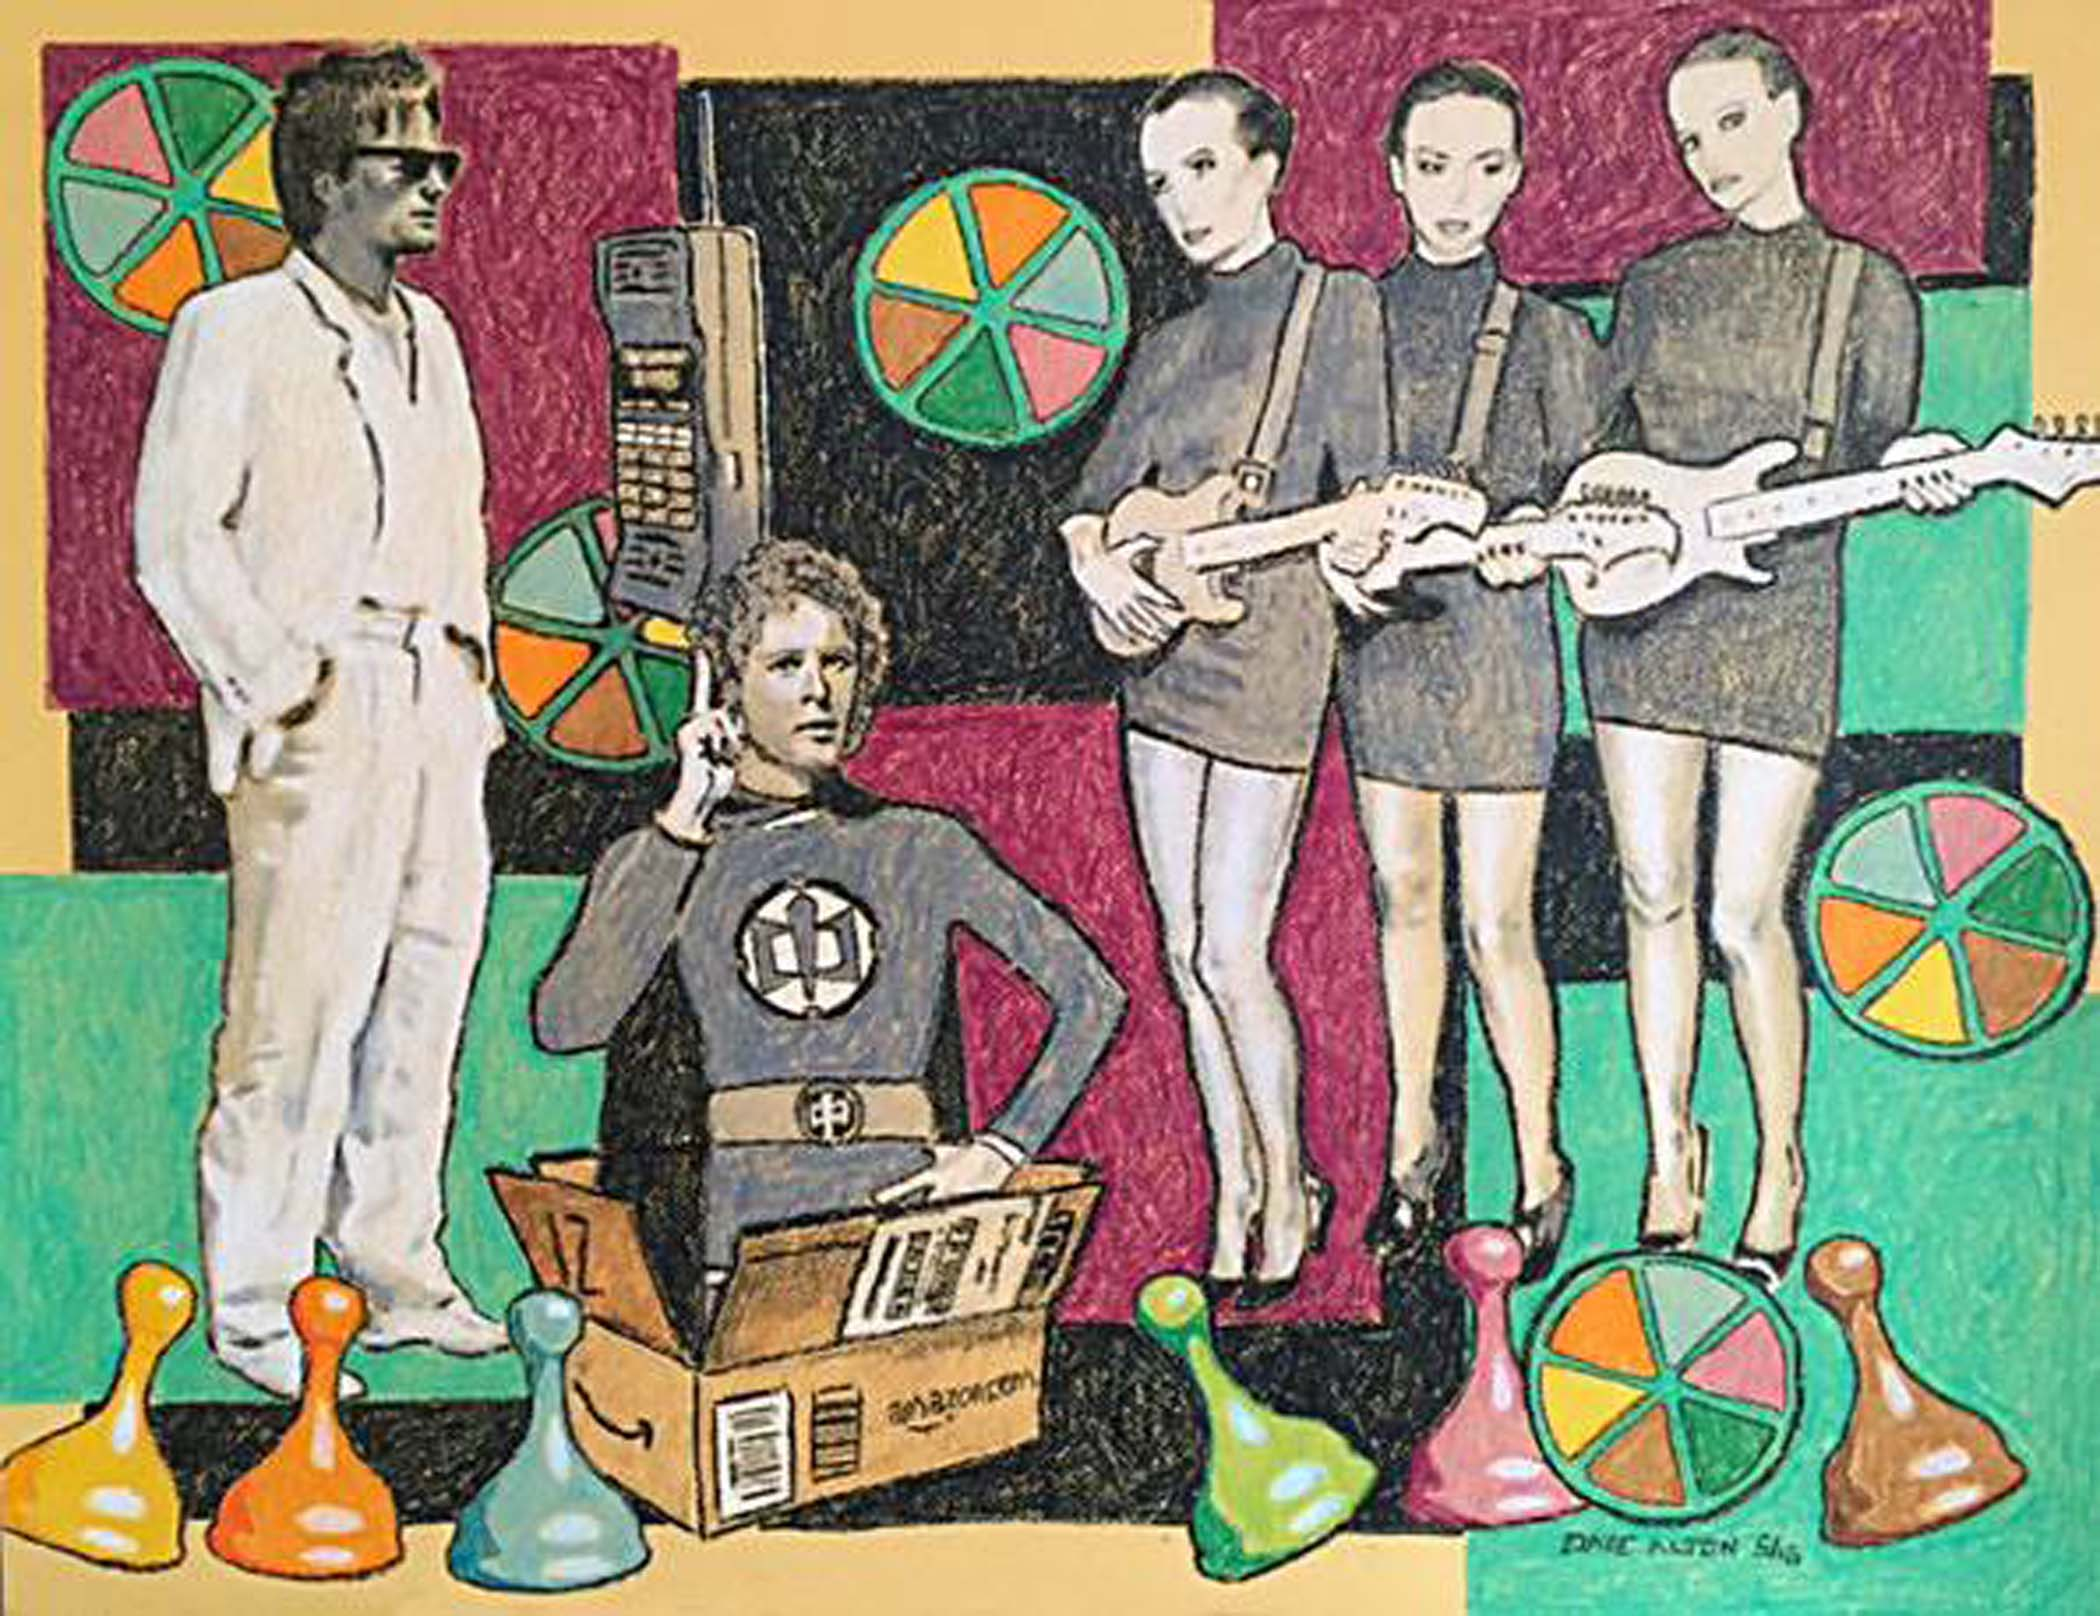 Dave Alton crayola crayon series irresistible pursuit